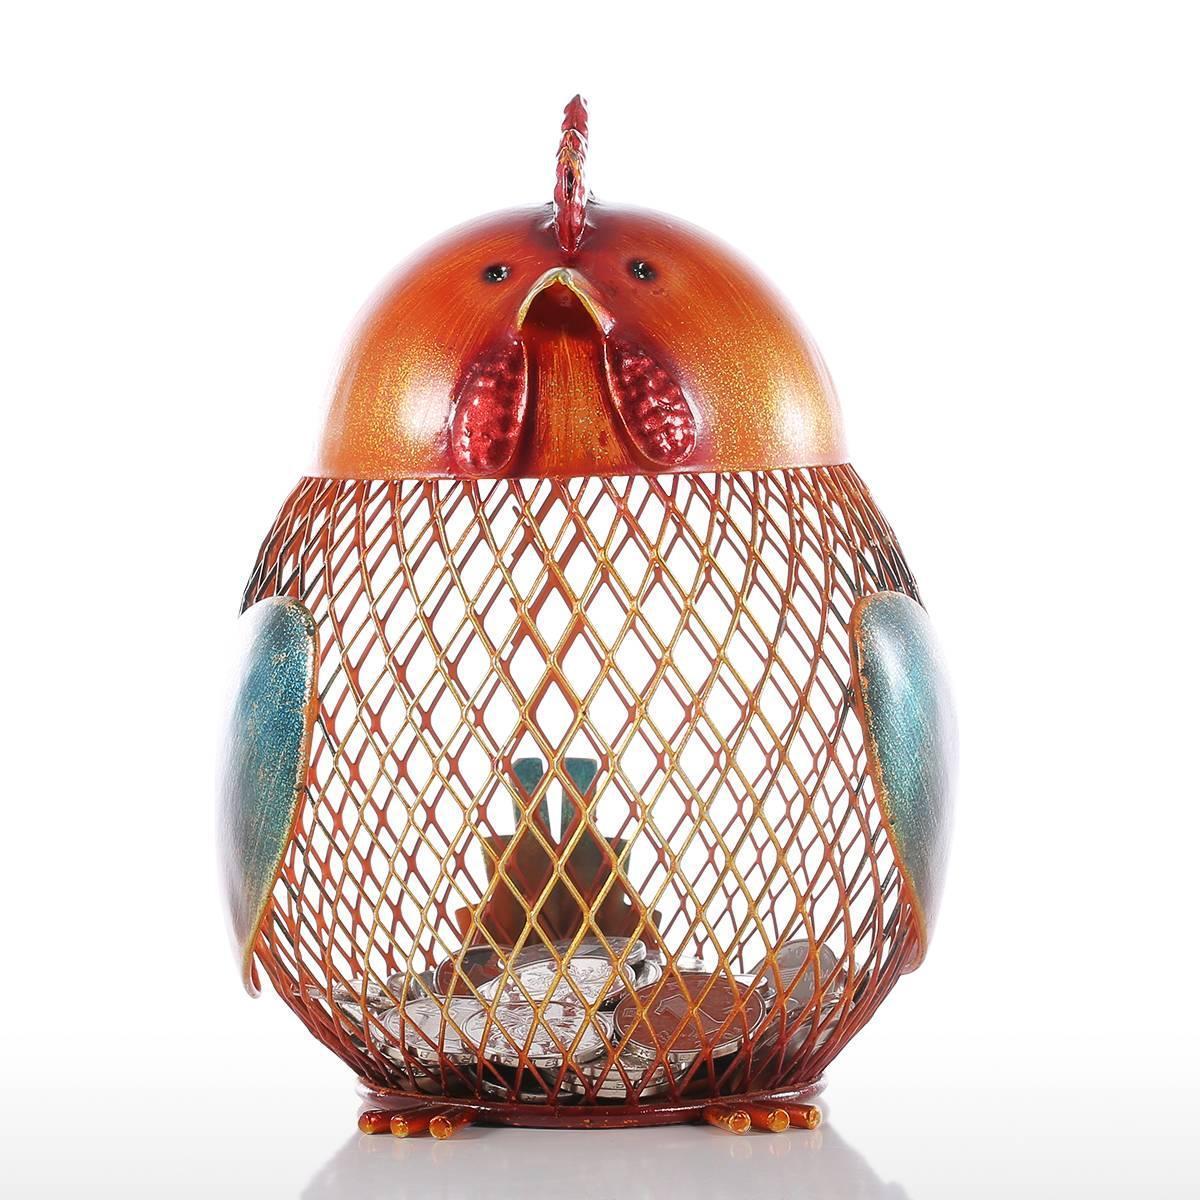 Iron  Piggy/Chick/Dog  Bank Coin  Storage Case Home Decoration Animal Figure Iron Art Chick piggy bank